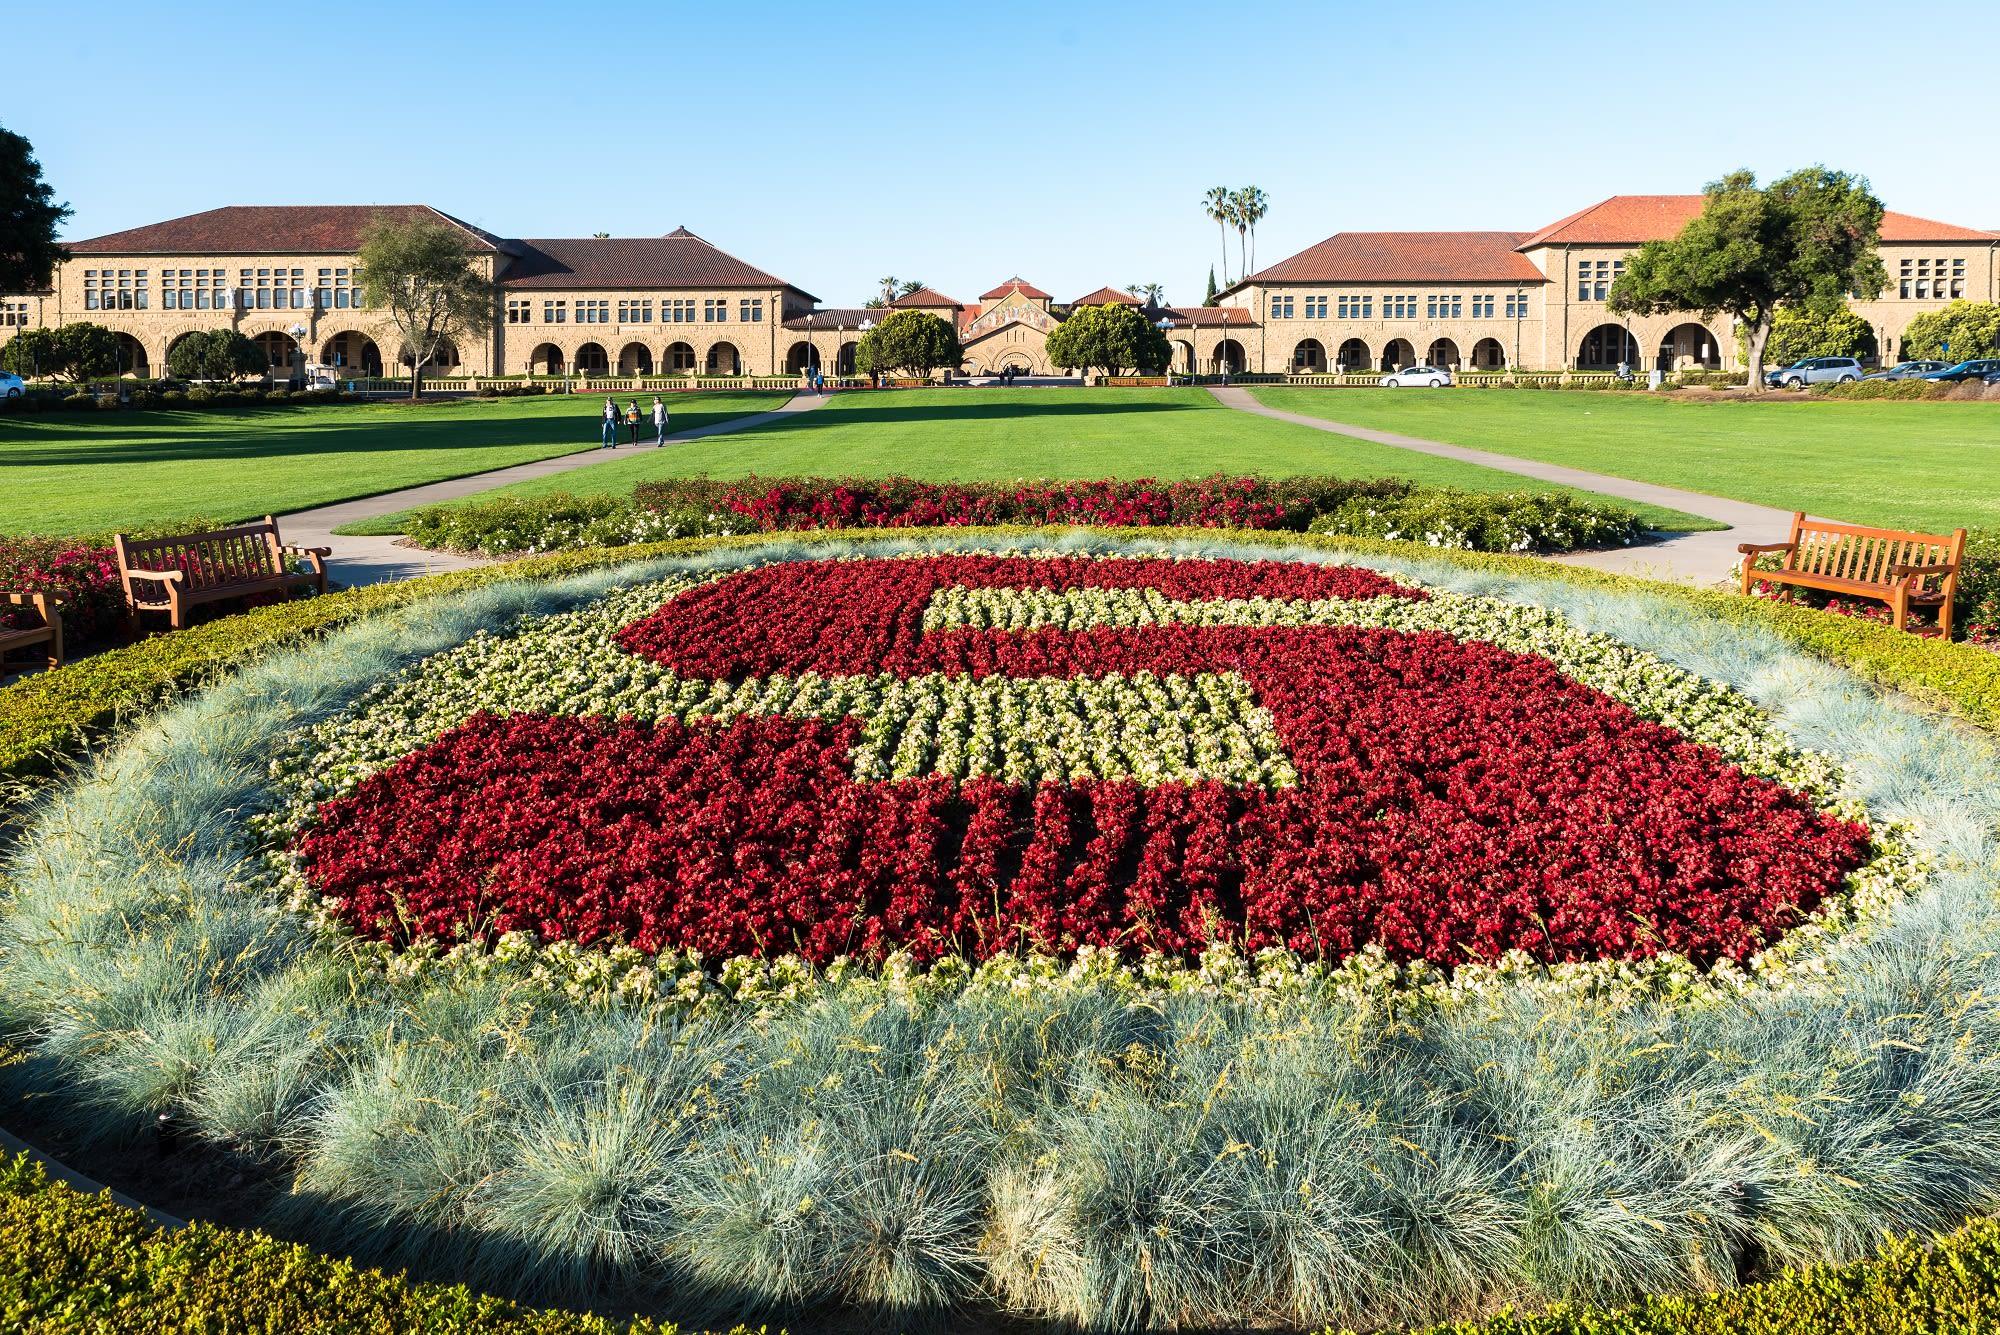 104985392-Main_Camus_of_Stanford.jpg